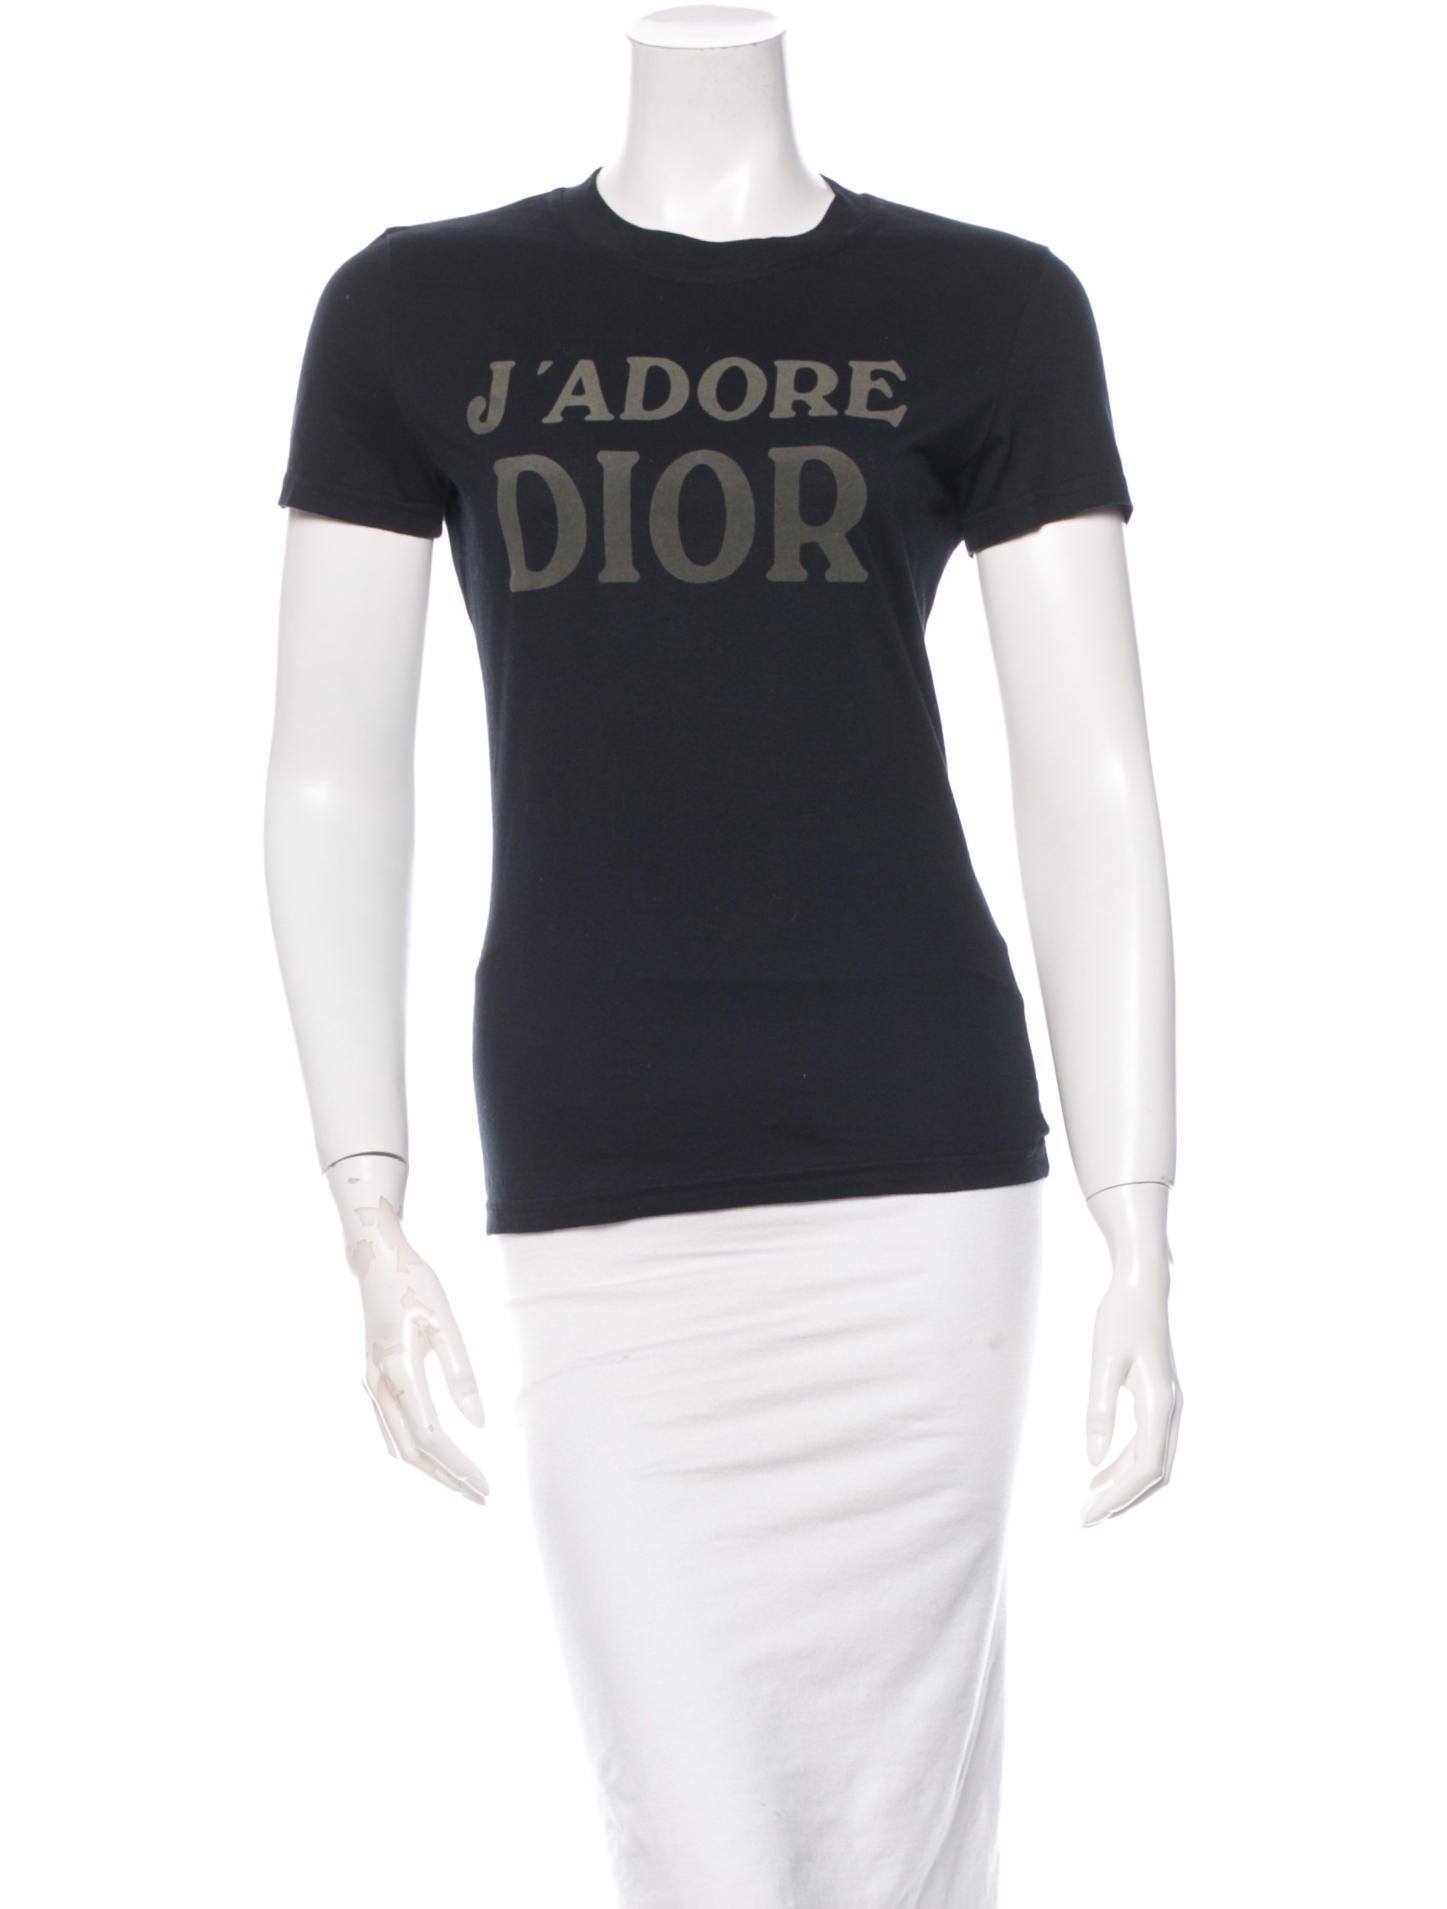 bc421235 Christian Dior T-Shirt - Clothing - CHR30847 | The RealReal